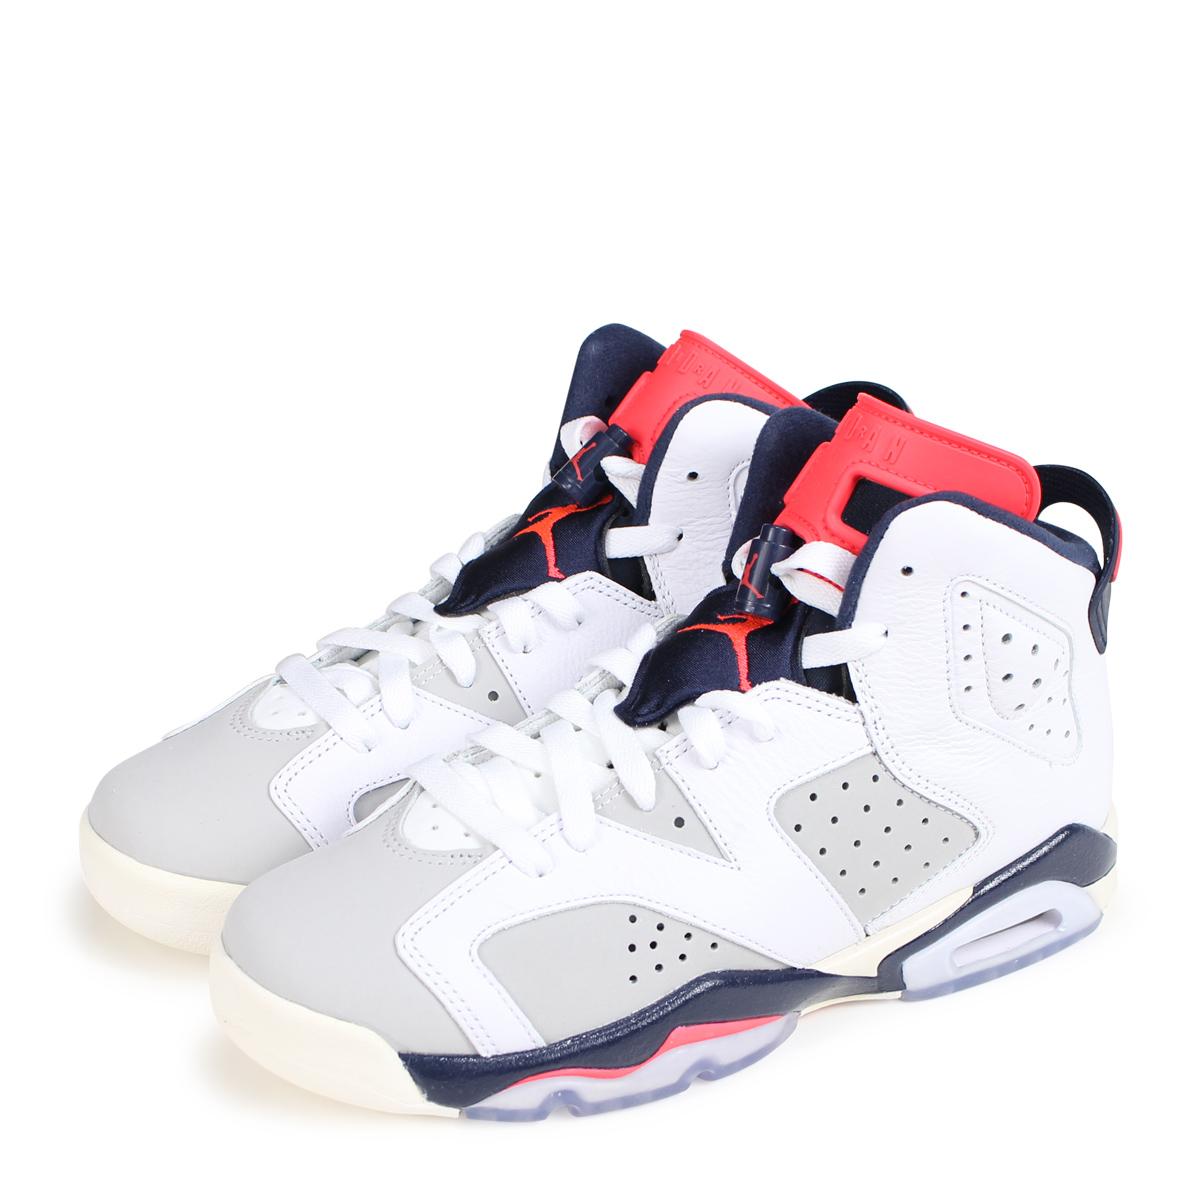 000a7e0ab2b649 NIKE AIR JORDAN 6 RETRO GS Nike Air Jordan 6 nostalgic lady s sneakers  384